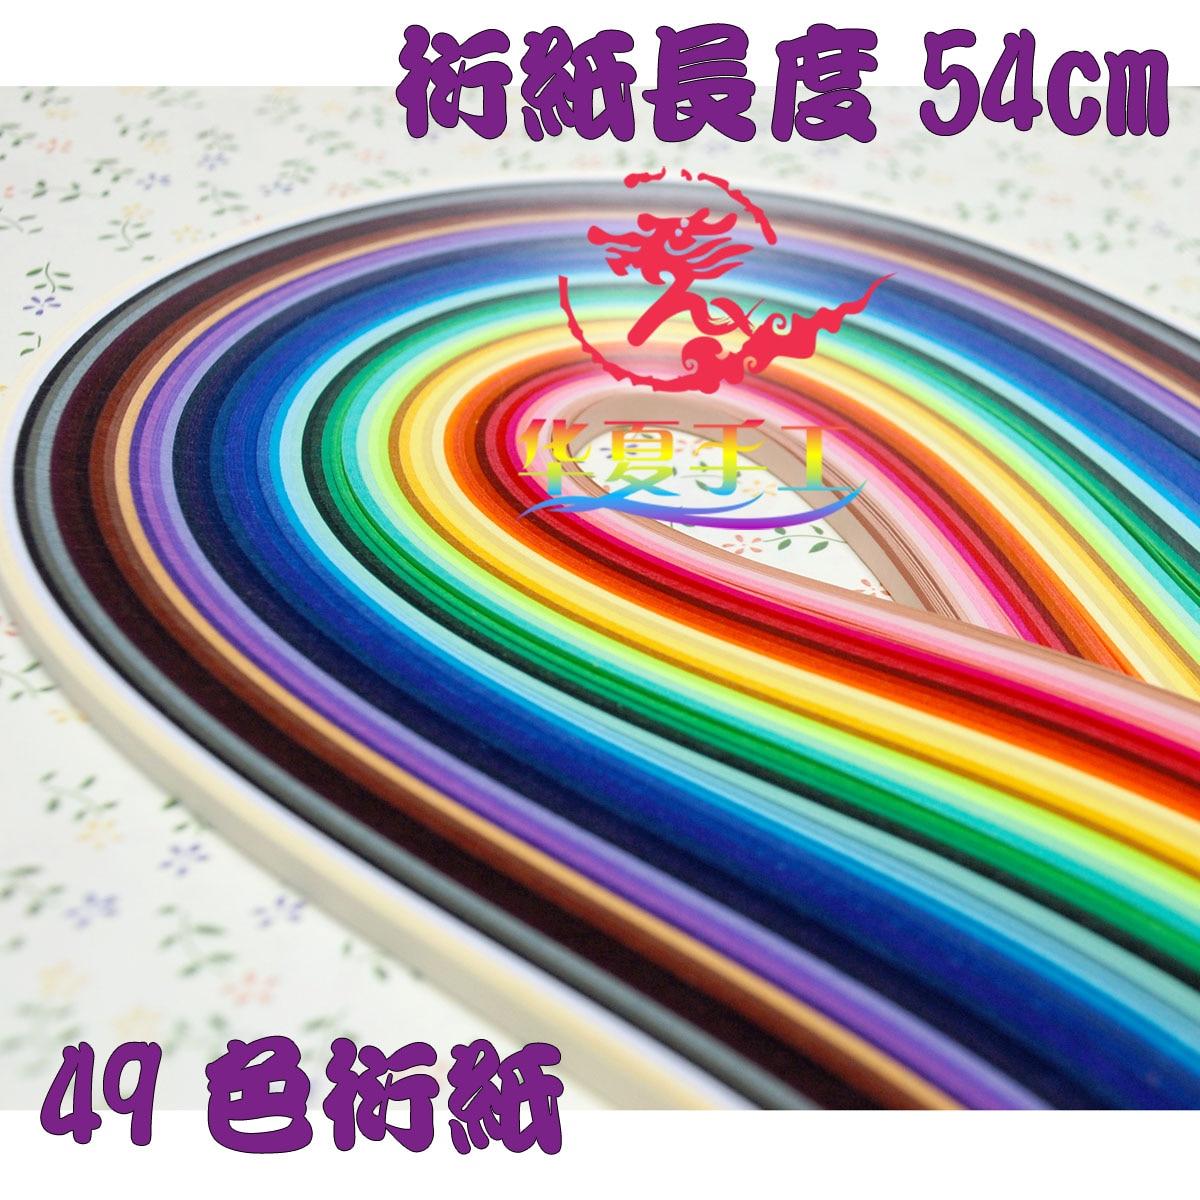 490 PCS DIY paper craft papel colorido crianças origami material 49 cores papel quilling quilling